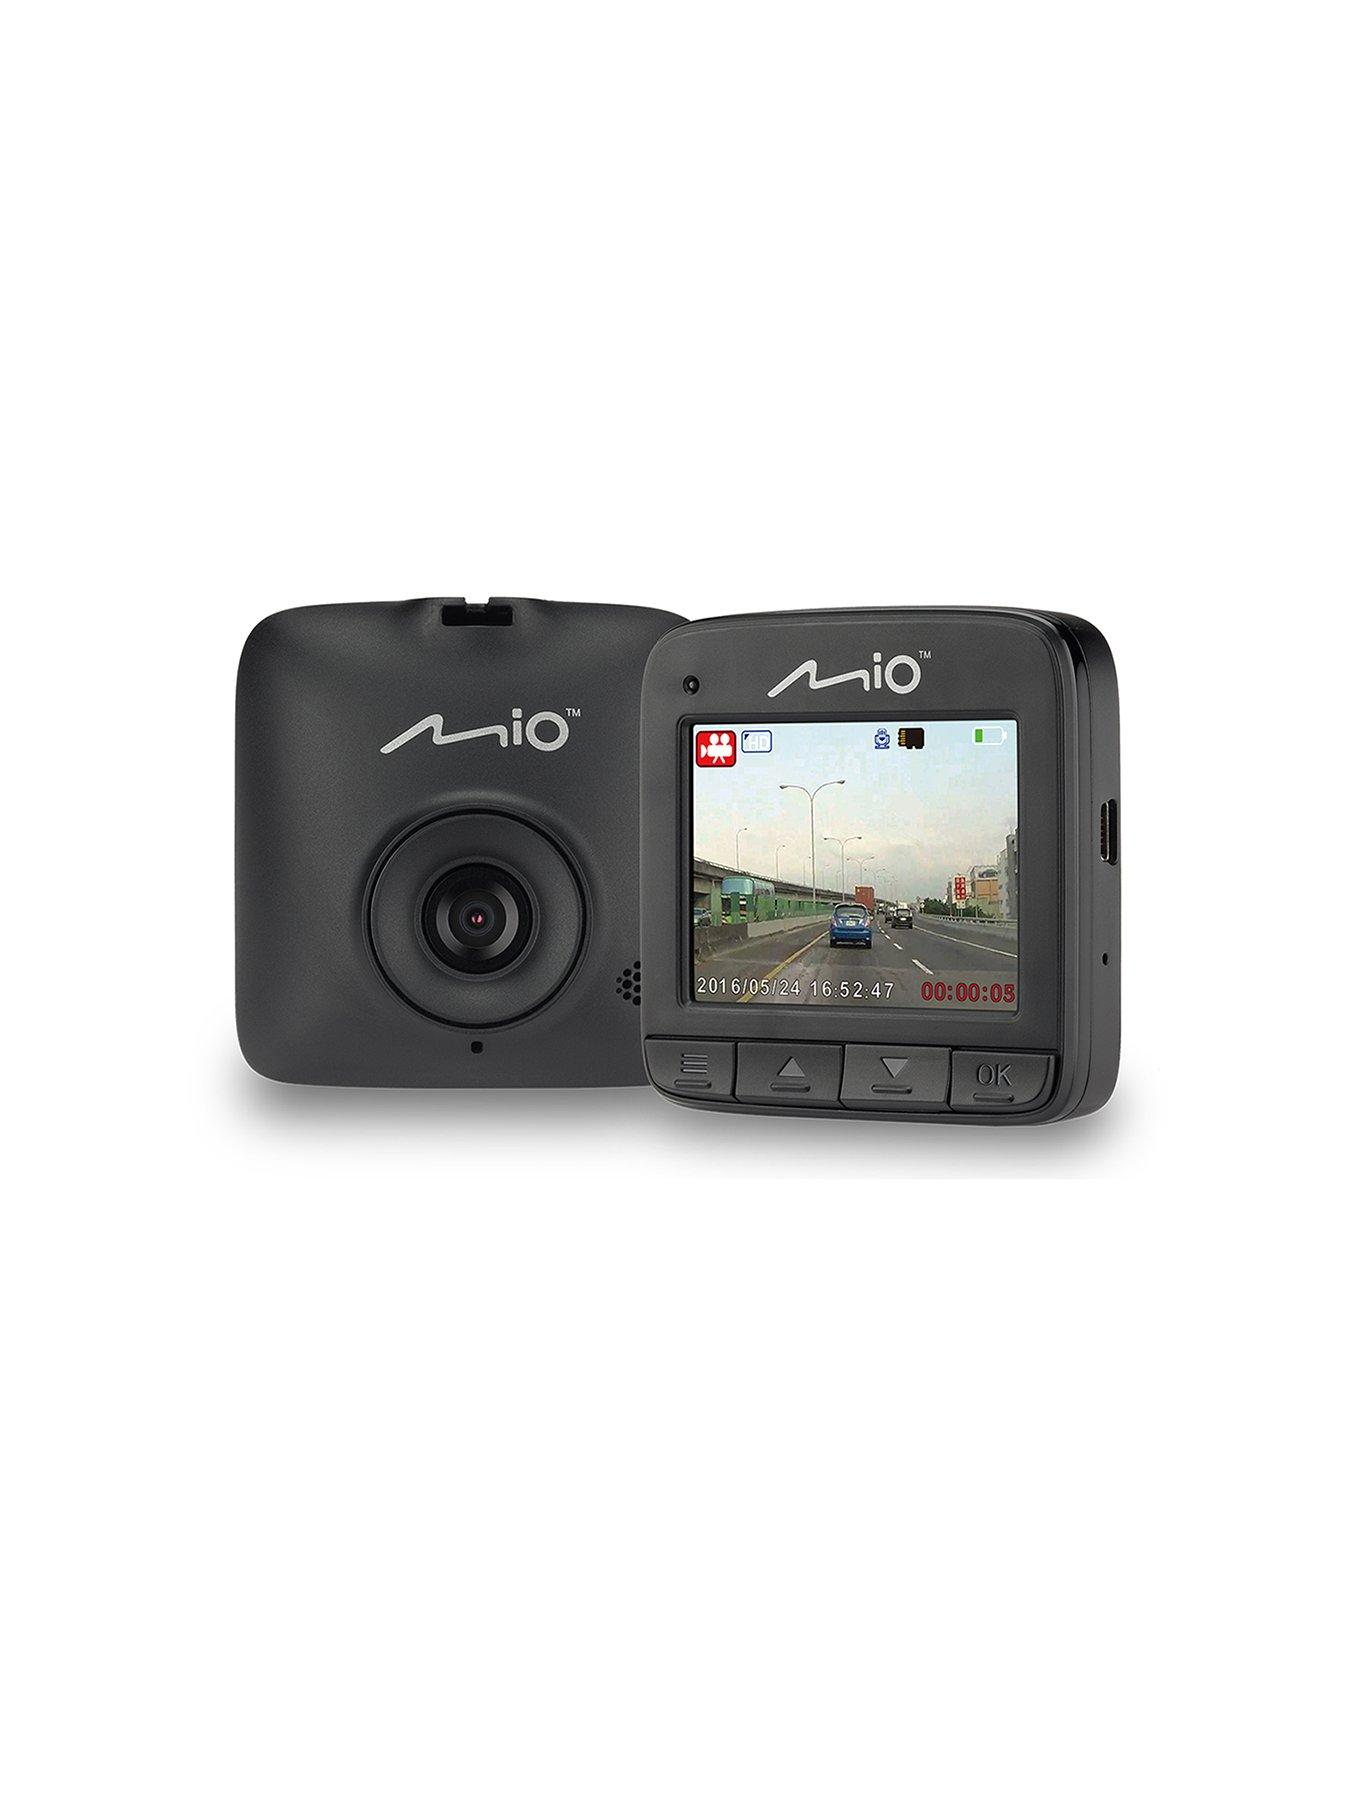 mio mivue c310 dash cam with 720p hd 3 axis g sensor 2 3 inch lcd rh littlewoodsireland ie C310 Anti-Torpedo C310 Roller